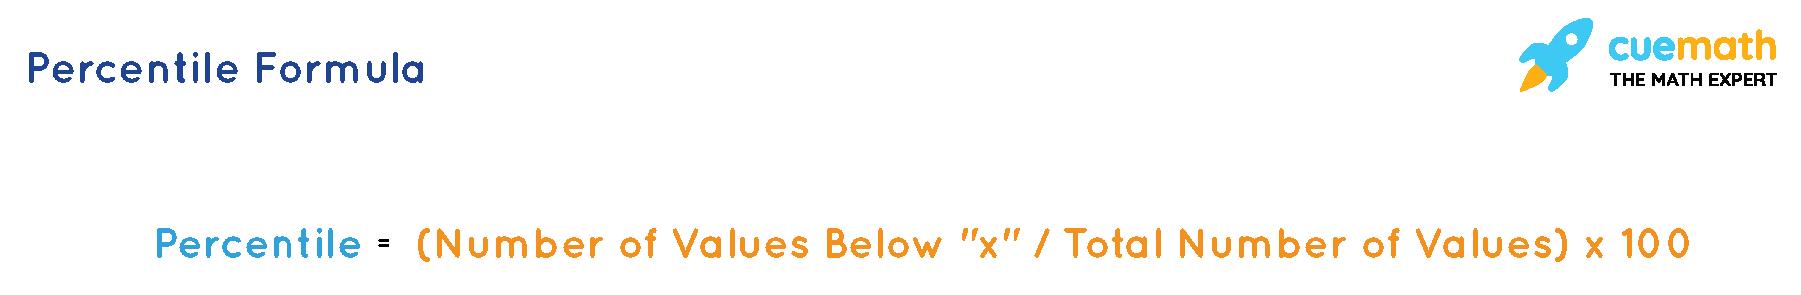 Percentile Formula